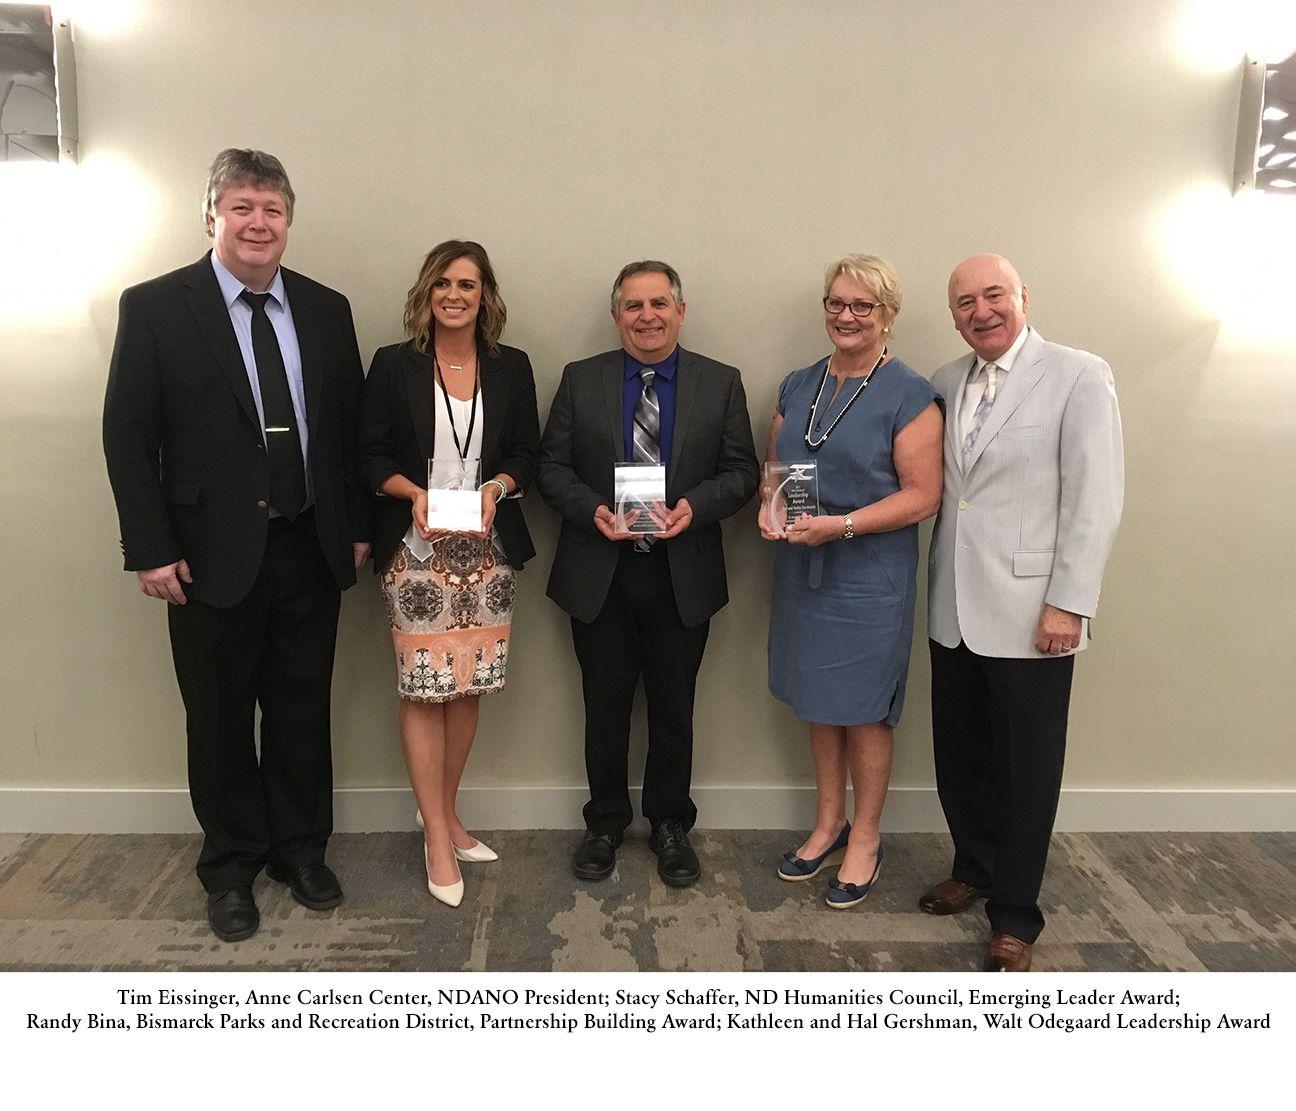 2017 North Dakota Nonprofit Awards Presented